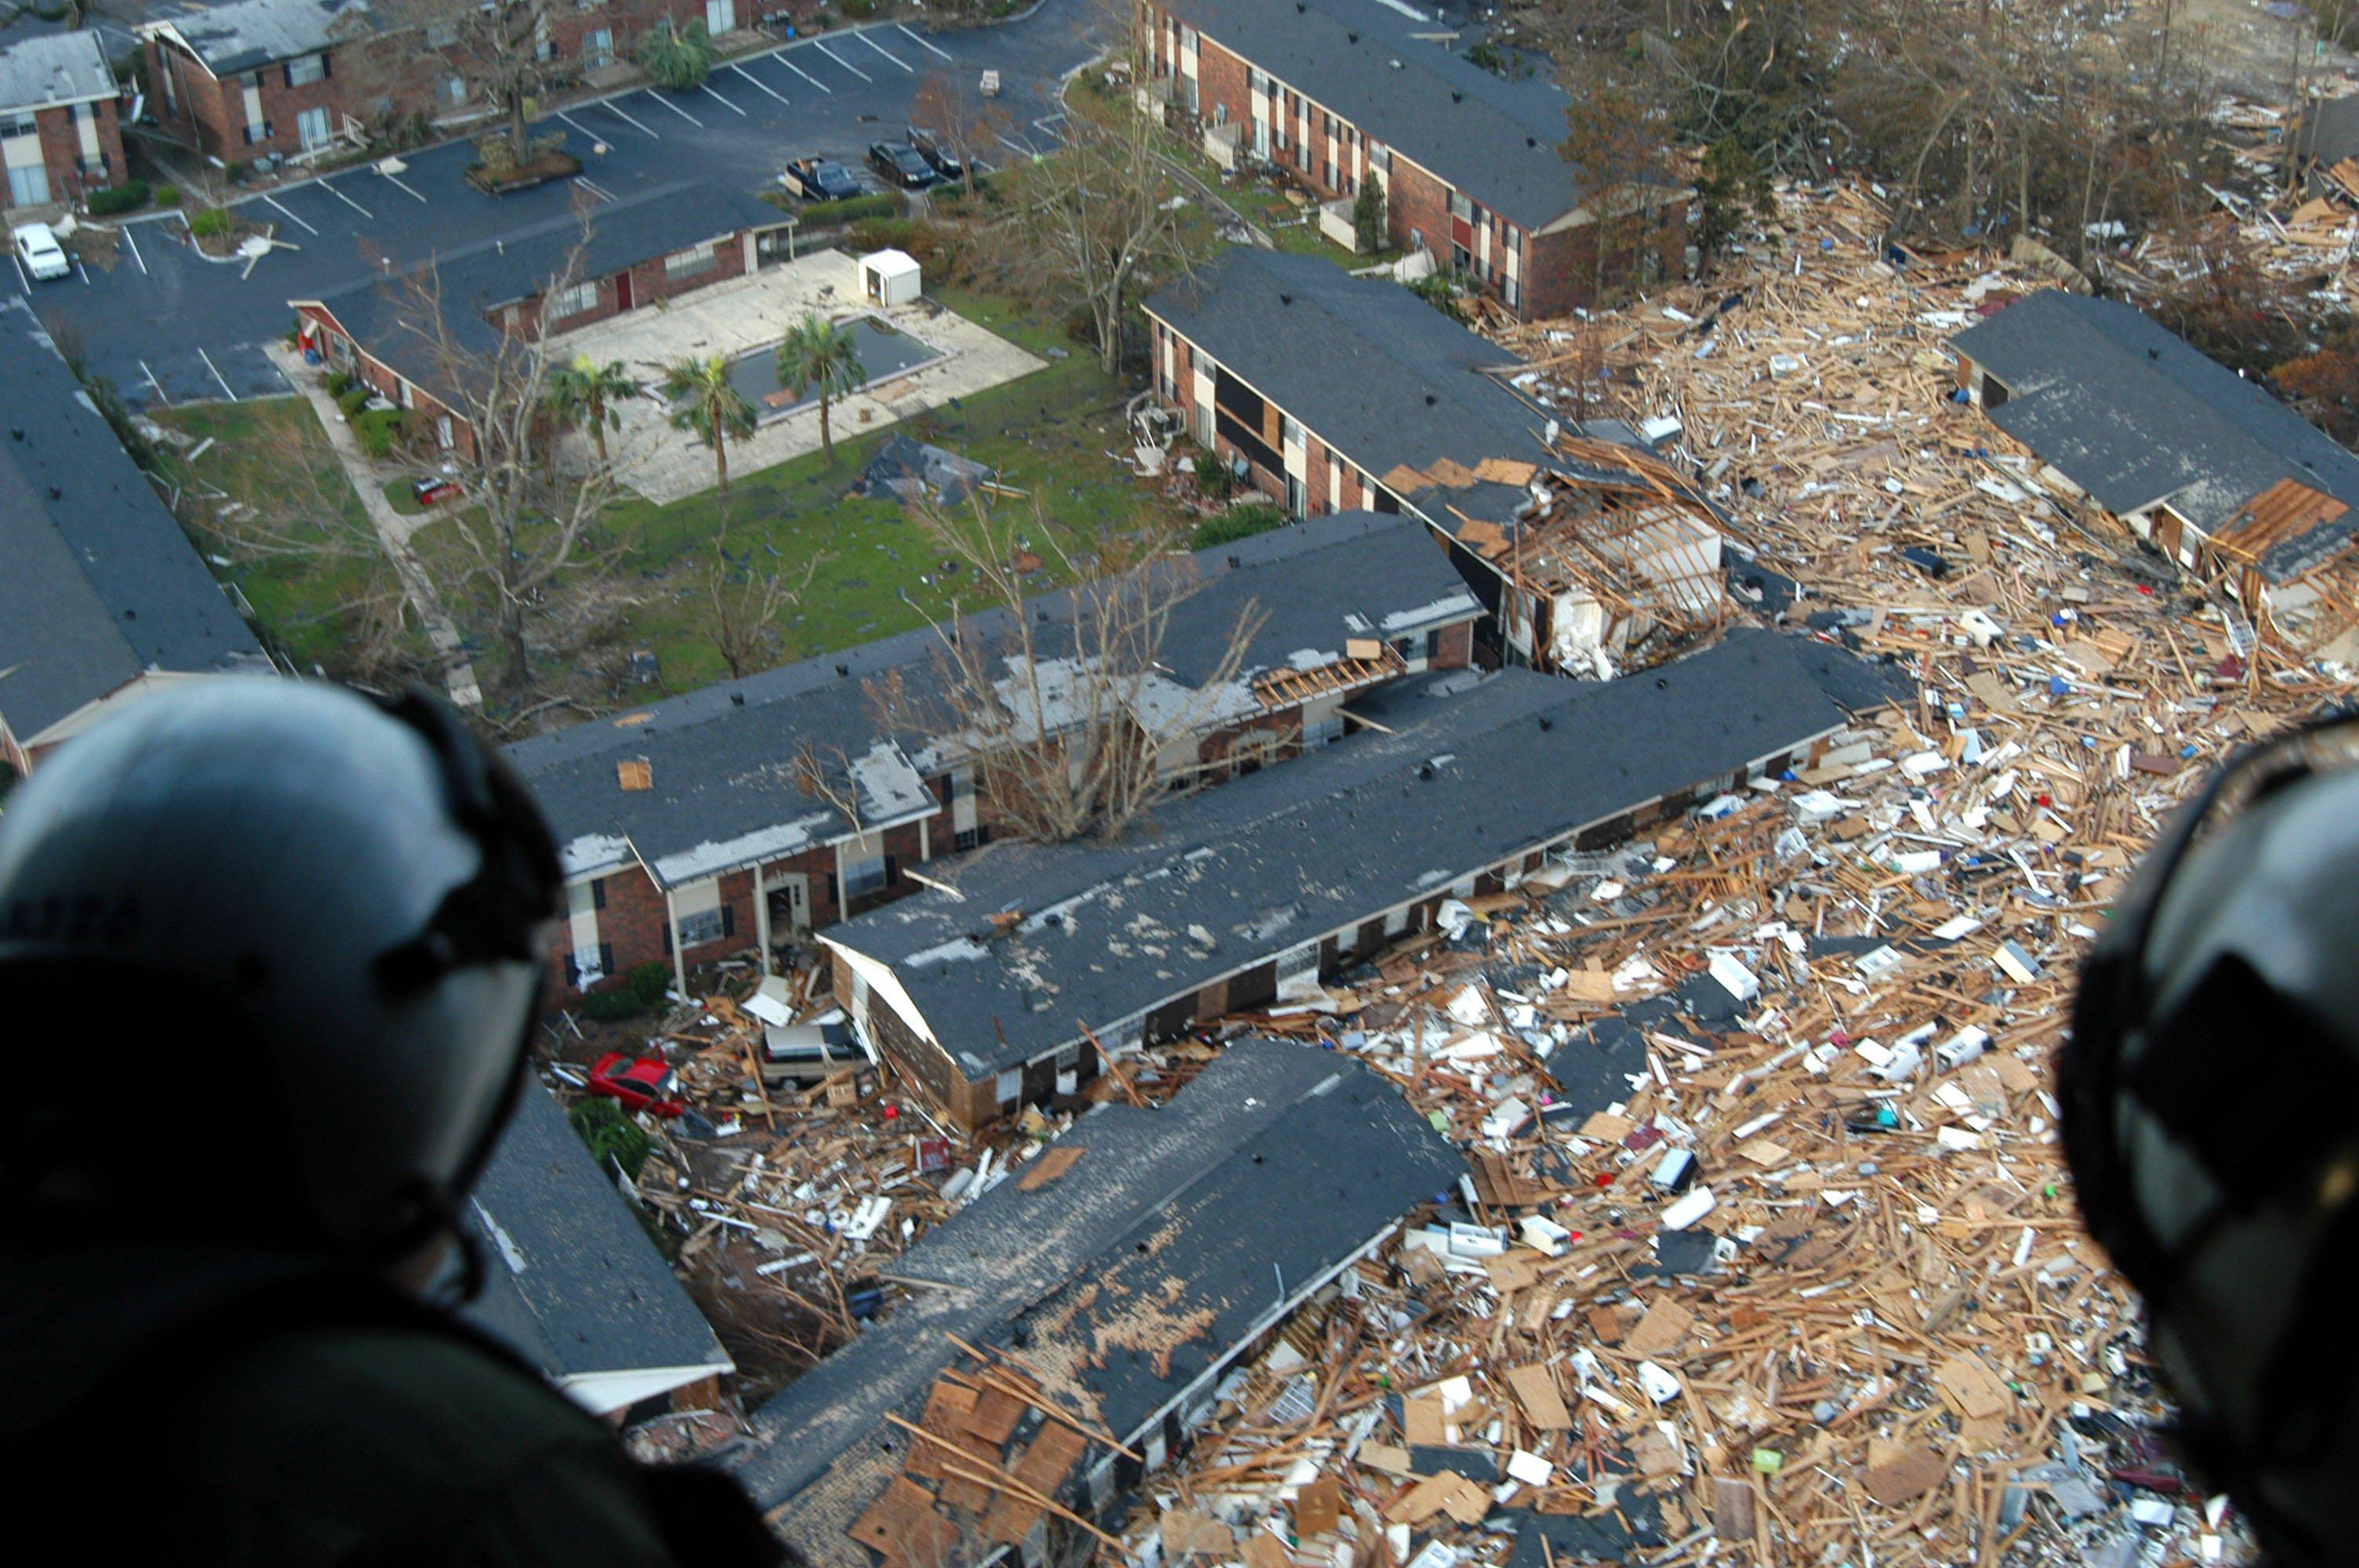 hurricane katrina damage deaths aftermath amp facts - 736×489